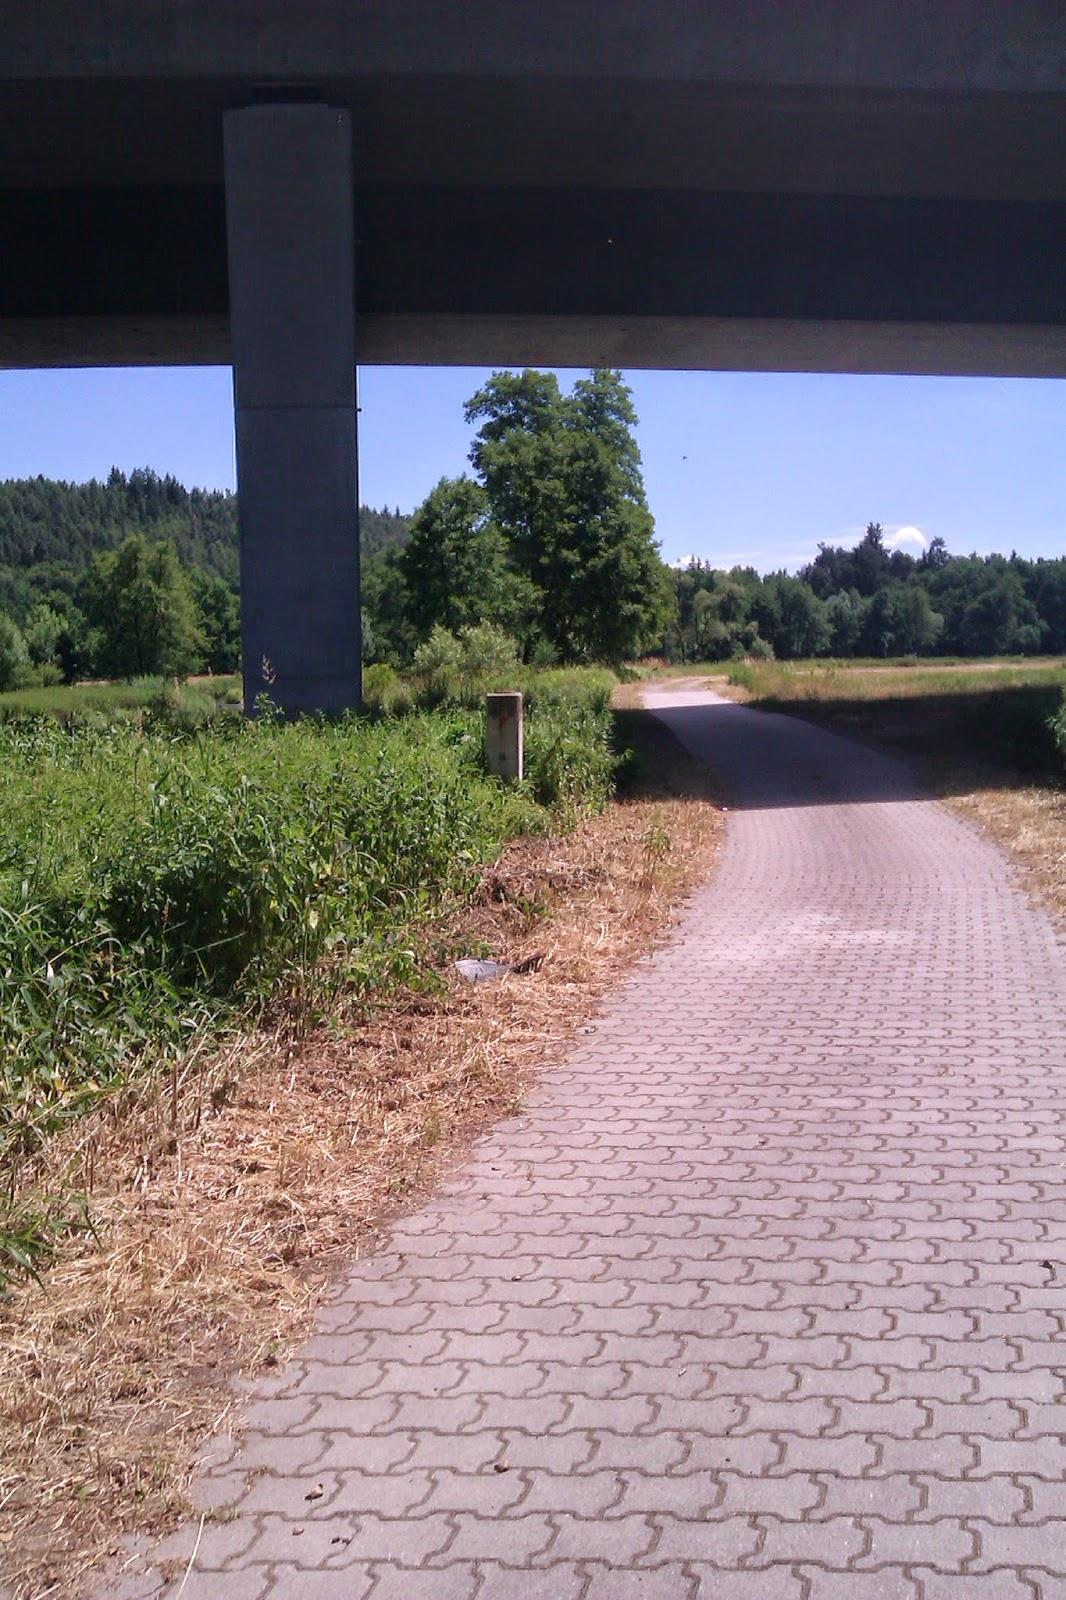 Naabtalradweg asphalt straßenpflaster